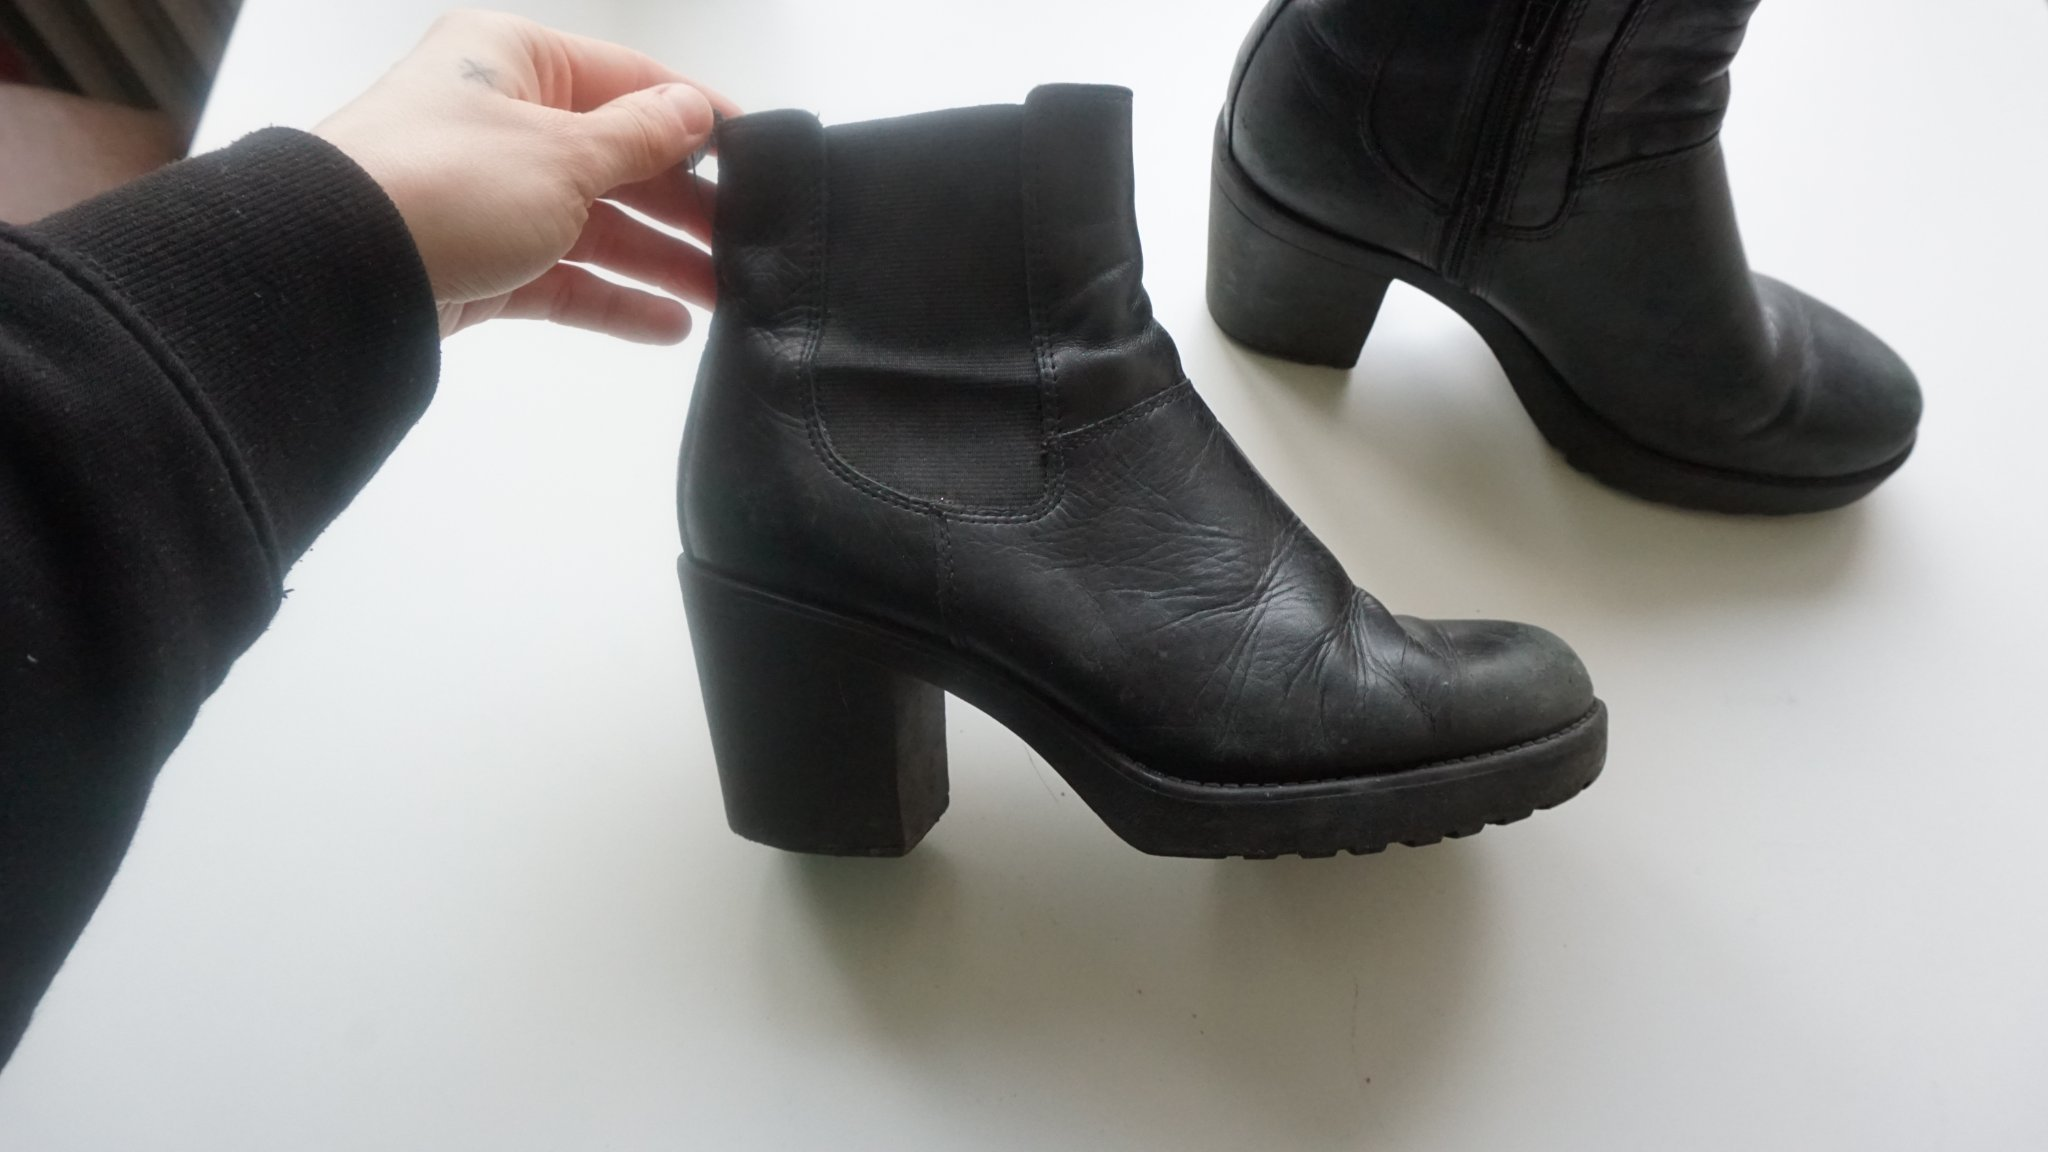 997401d4a7f Boots från Vagabond, klack, skinn, 90-tal, tren.. (351096931) ᐈ Köp ...